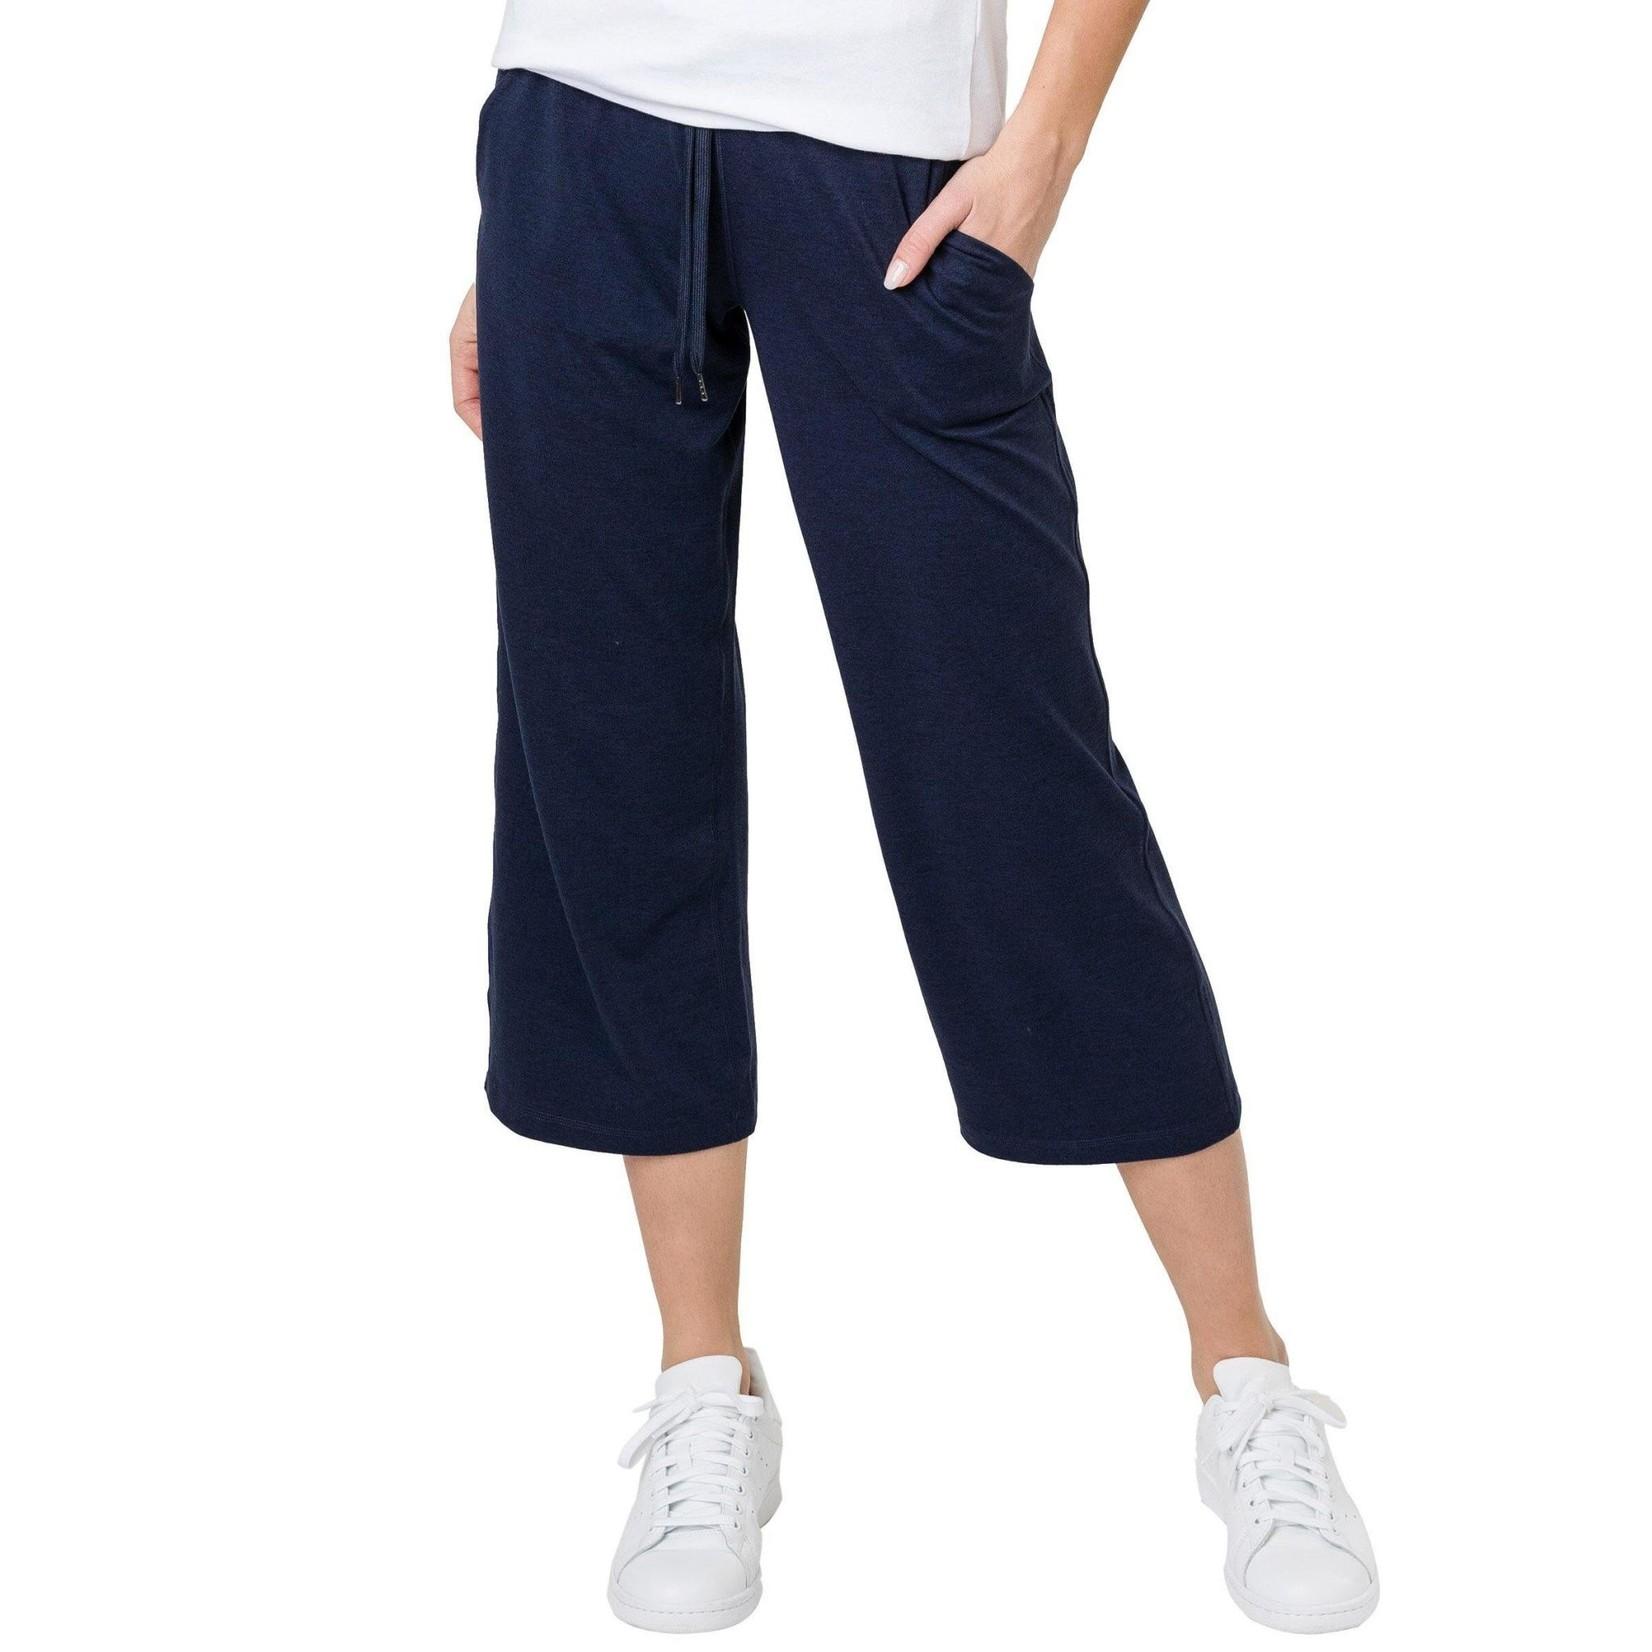 Tuff Athletics Ladies Gaucho Crop Pants-Navy-S